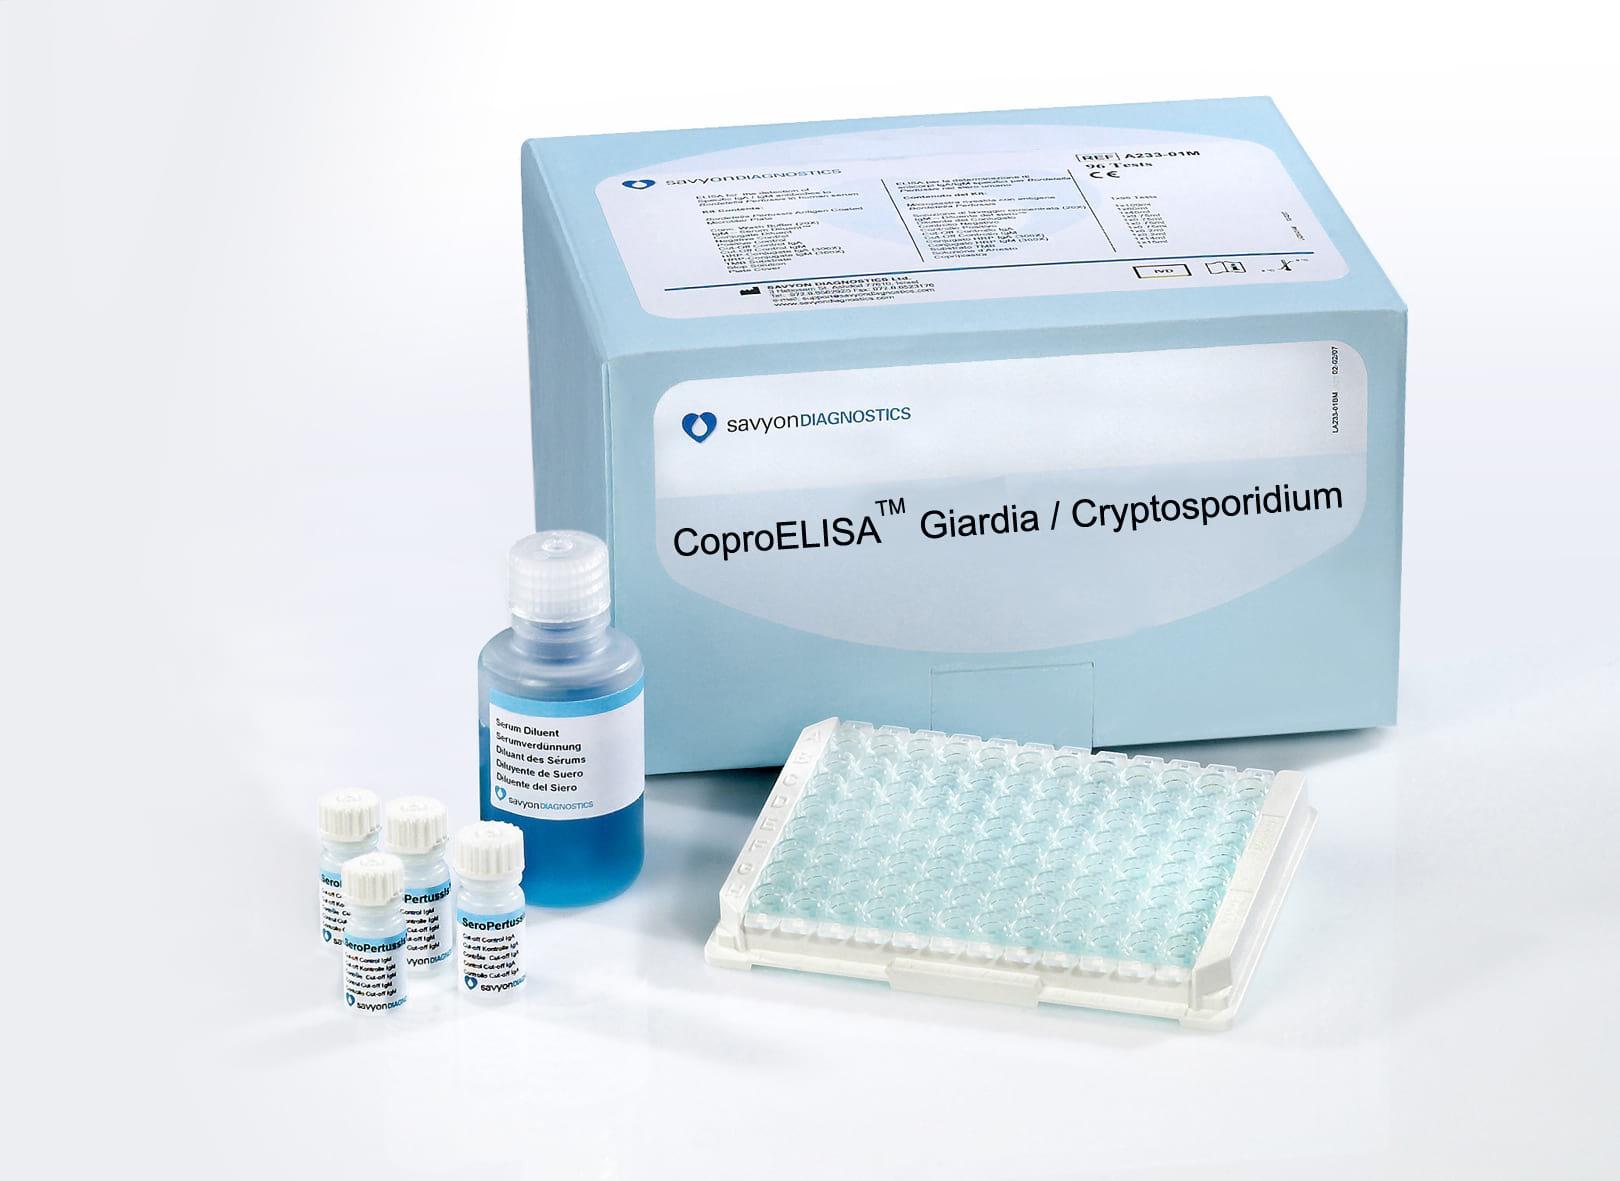 Giardia water test kit, Galandféreg kezelese